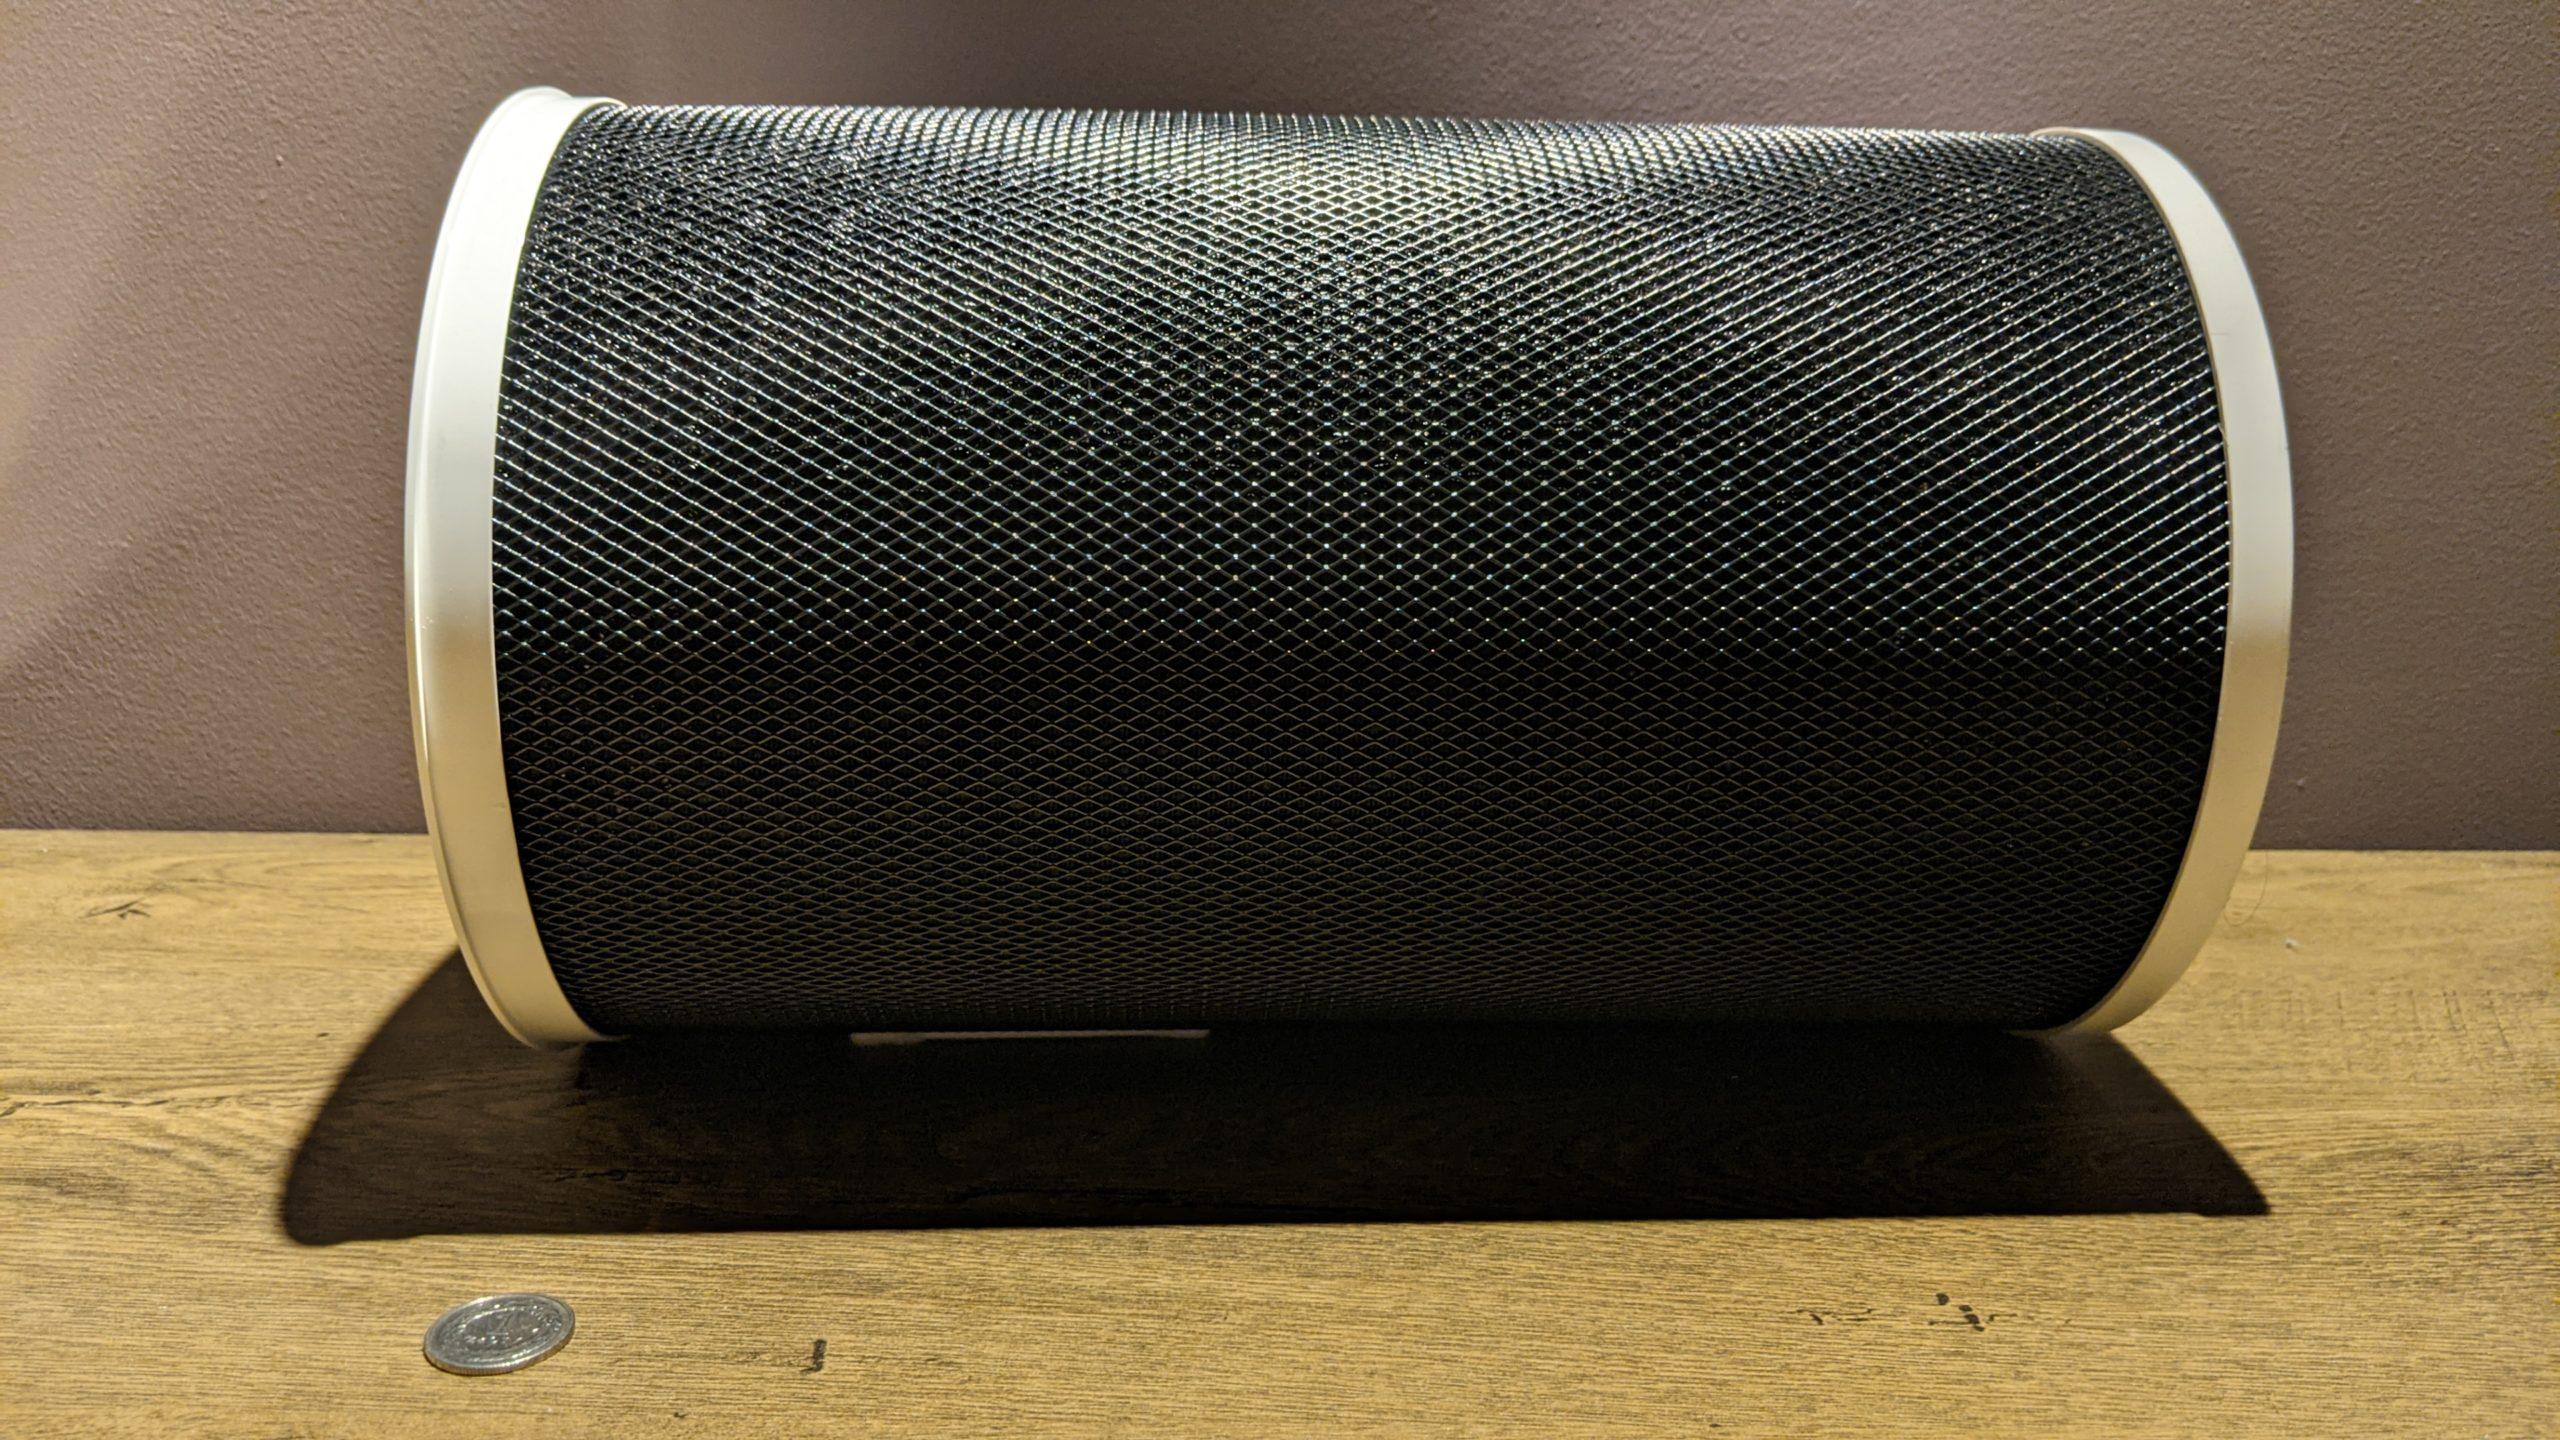 filtr węglowy viomi smart air purifier pro